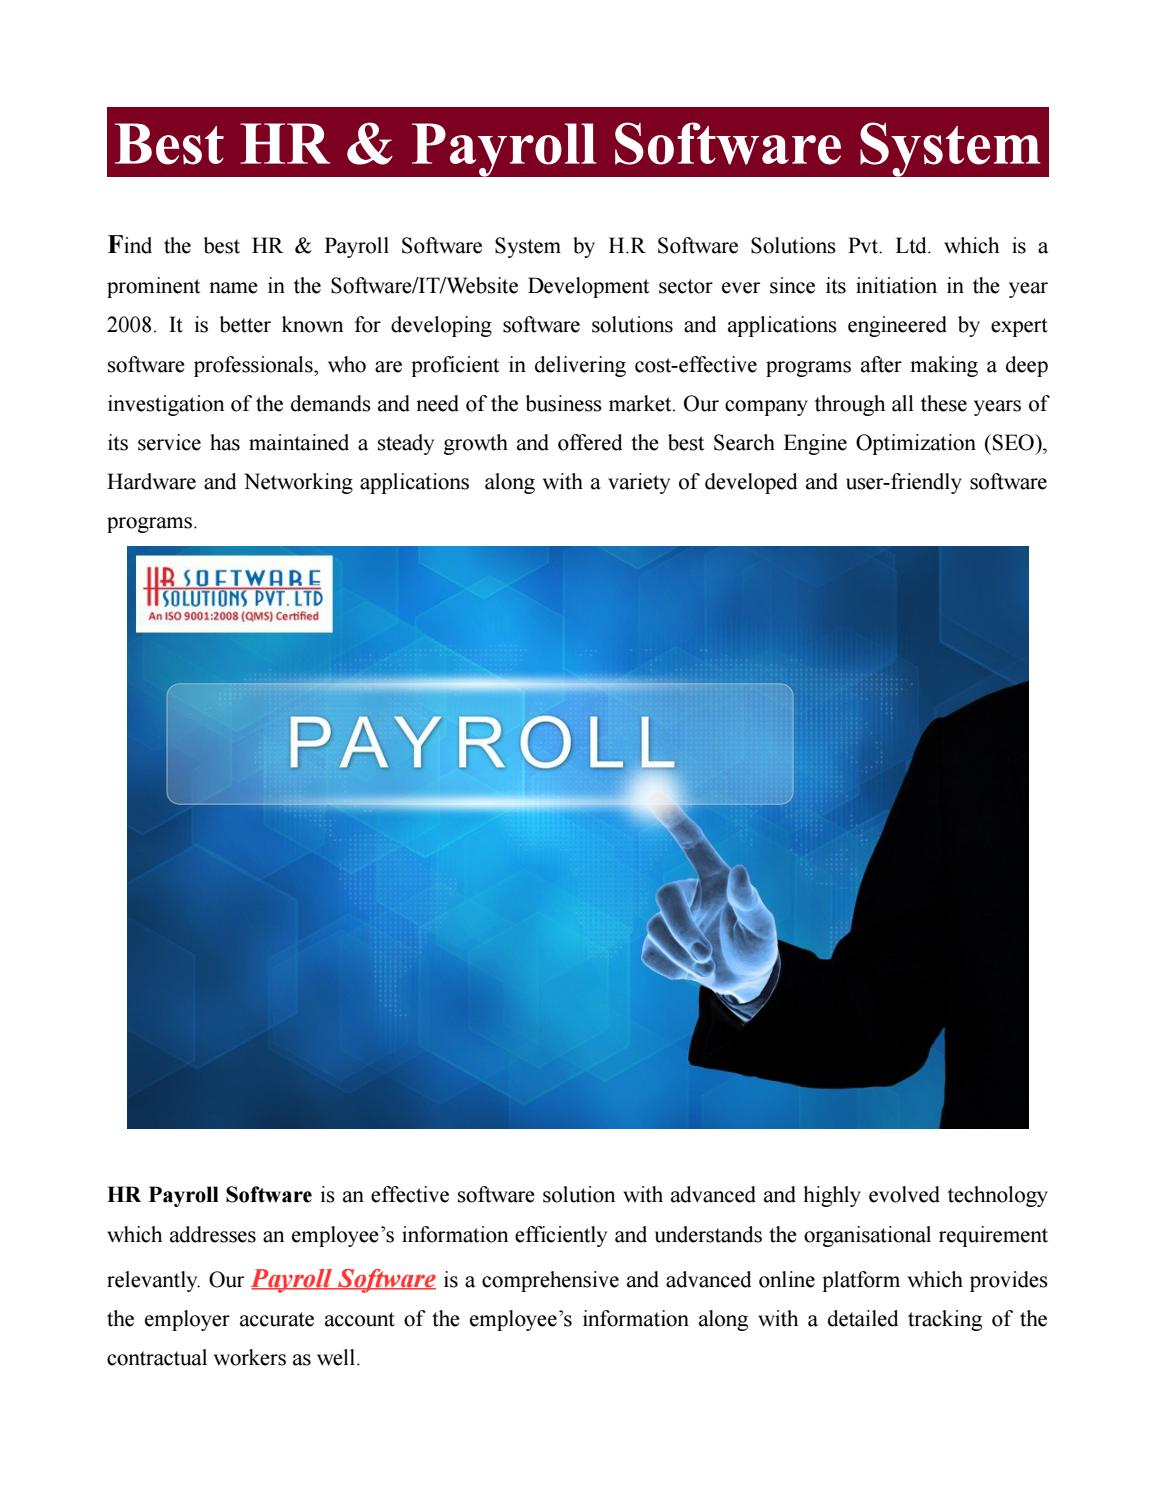 Best hr & payroll software system by Sumit Saxena - issuu